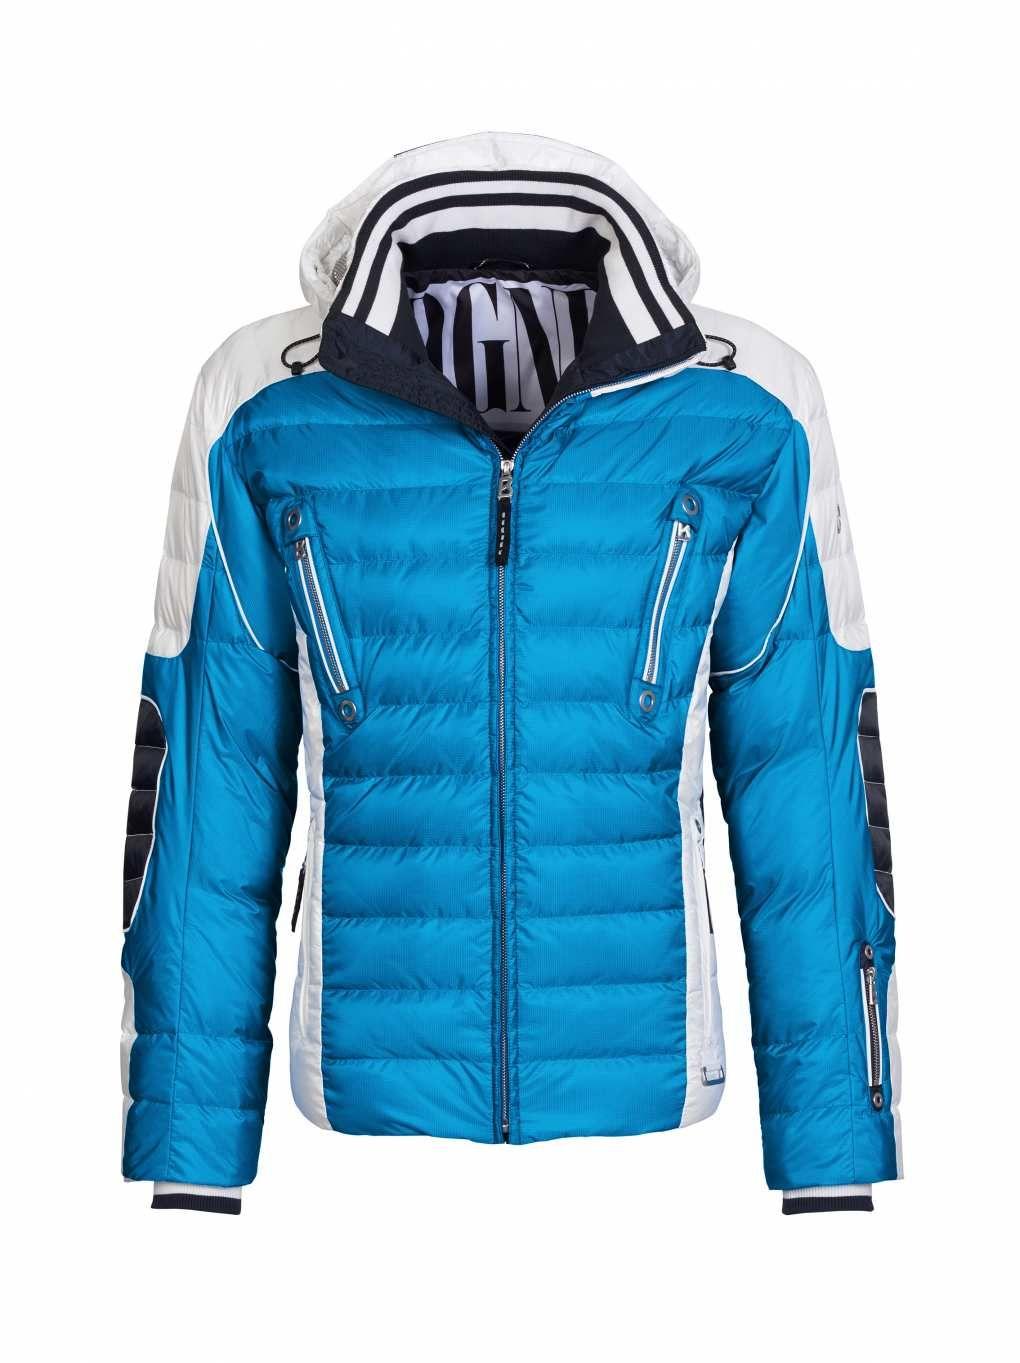 daunen skijacke ruven in blau f r herren bogner com ski jackets rh pinterest com